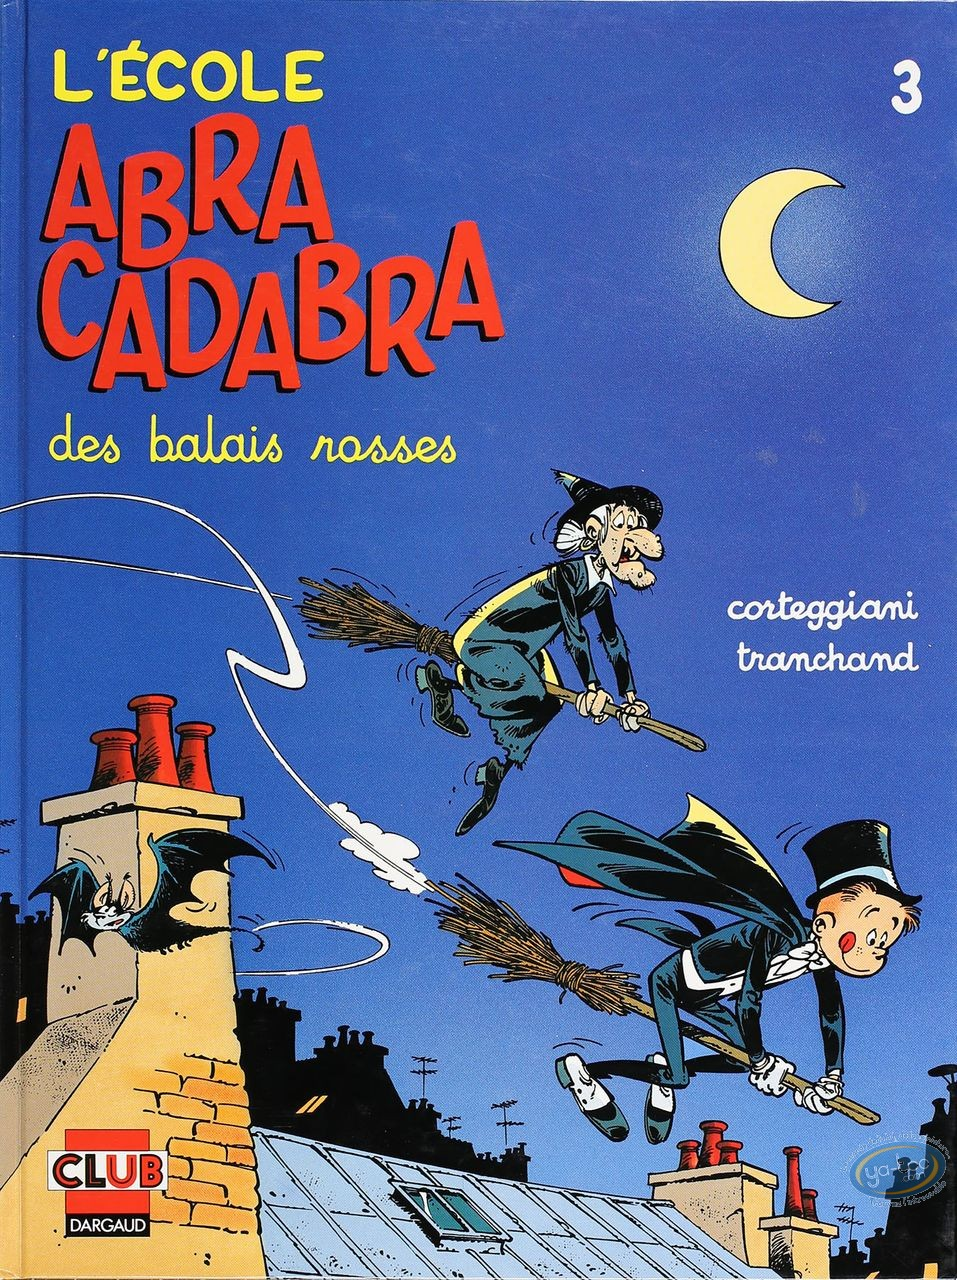 Listed European Comic Books, Ecole Abracadabra (L') : Des Balais Rosses (very good condition)